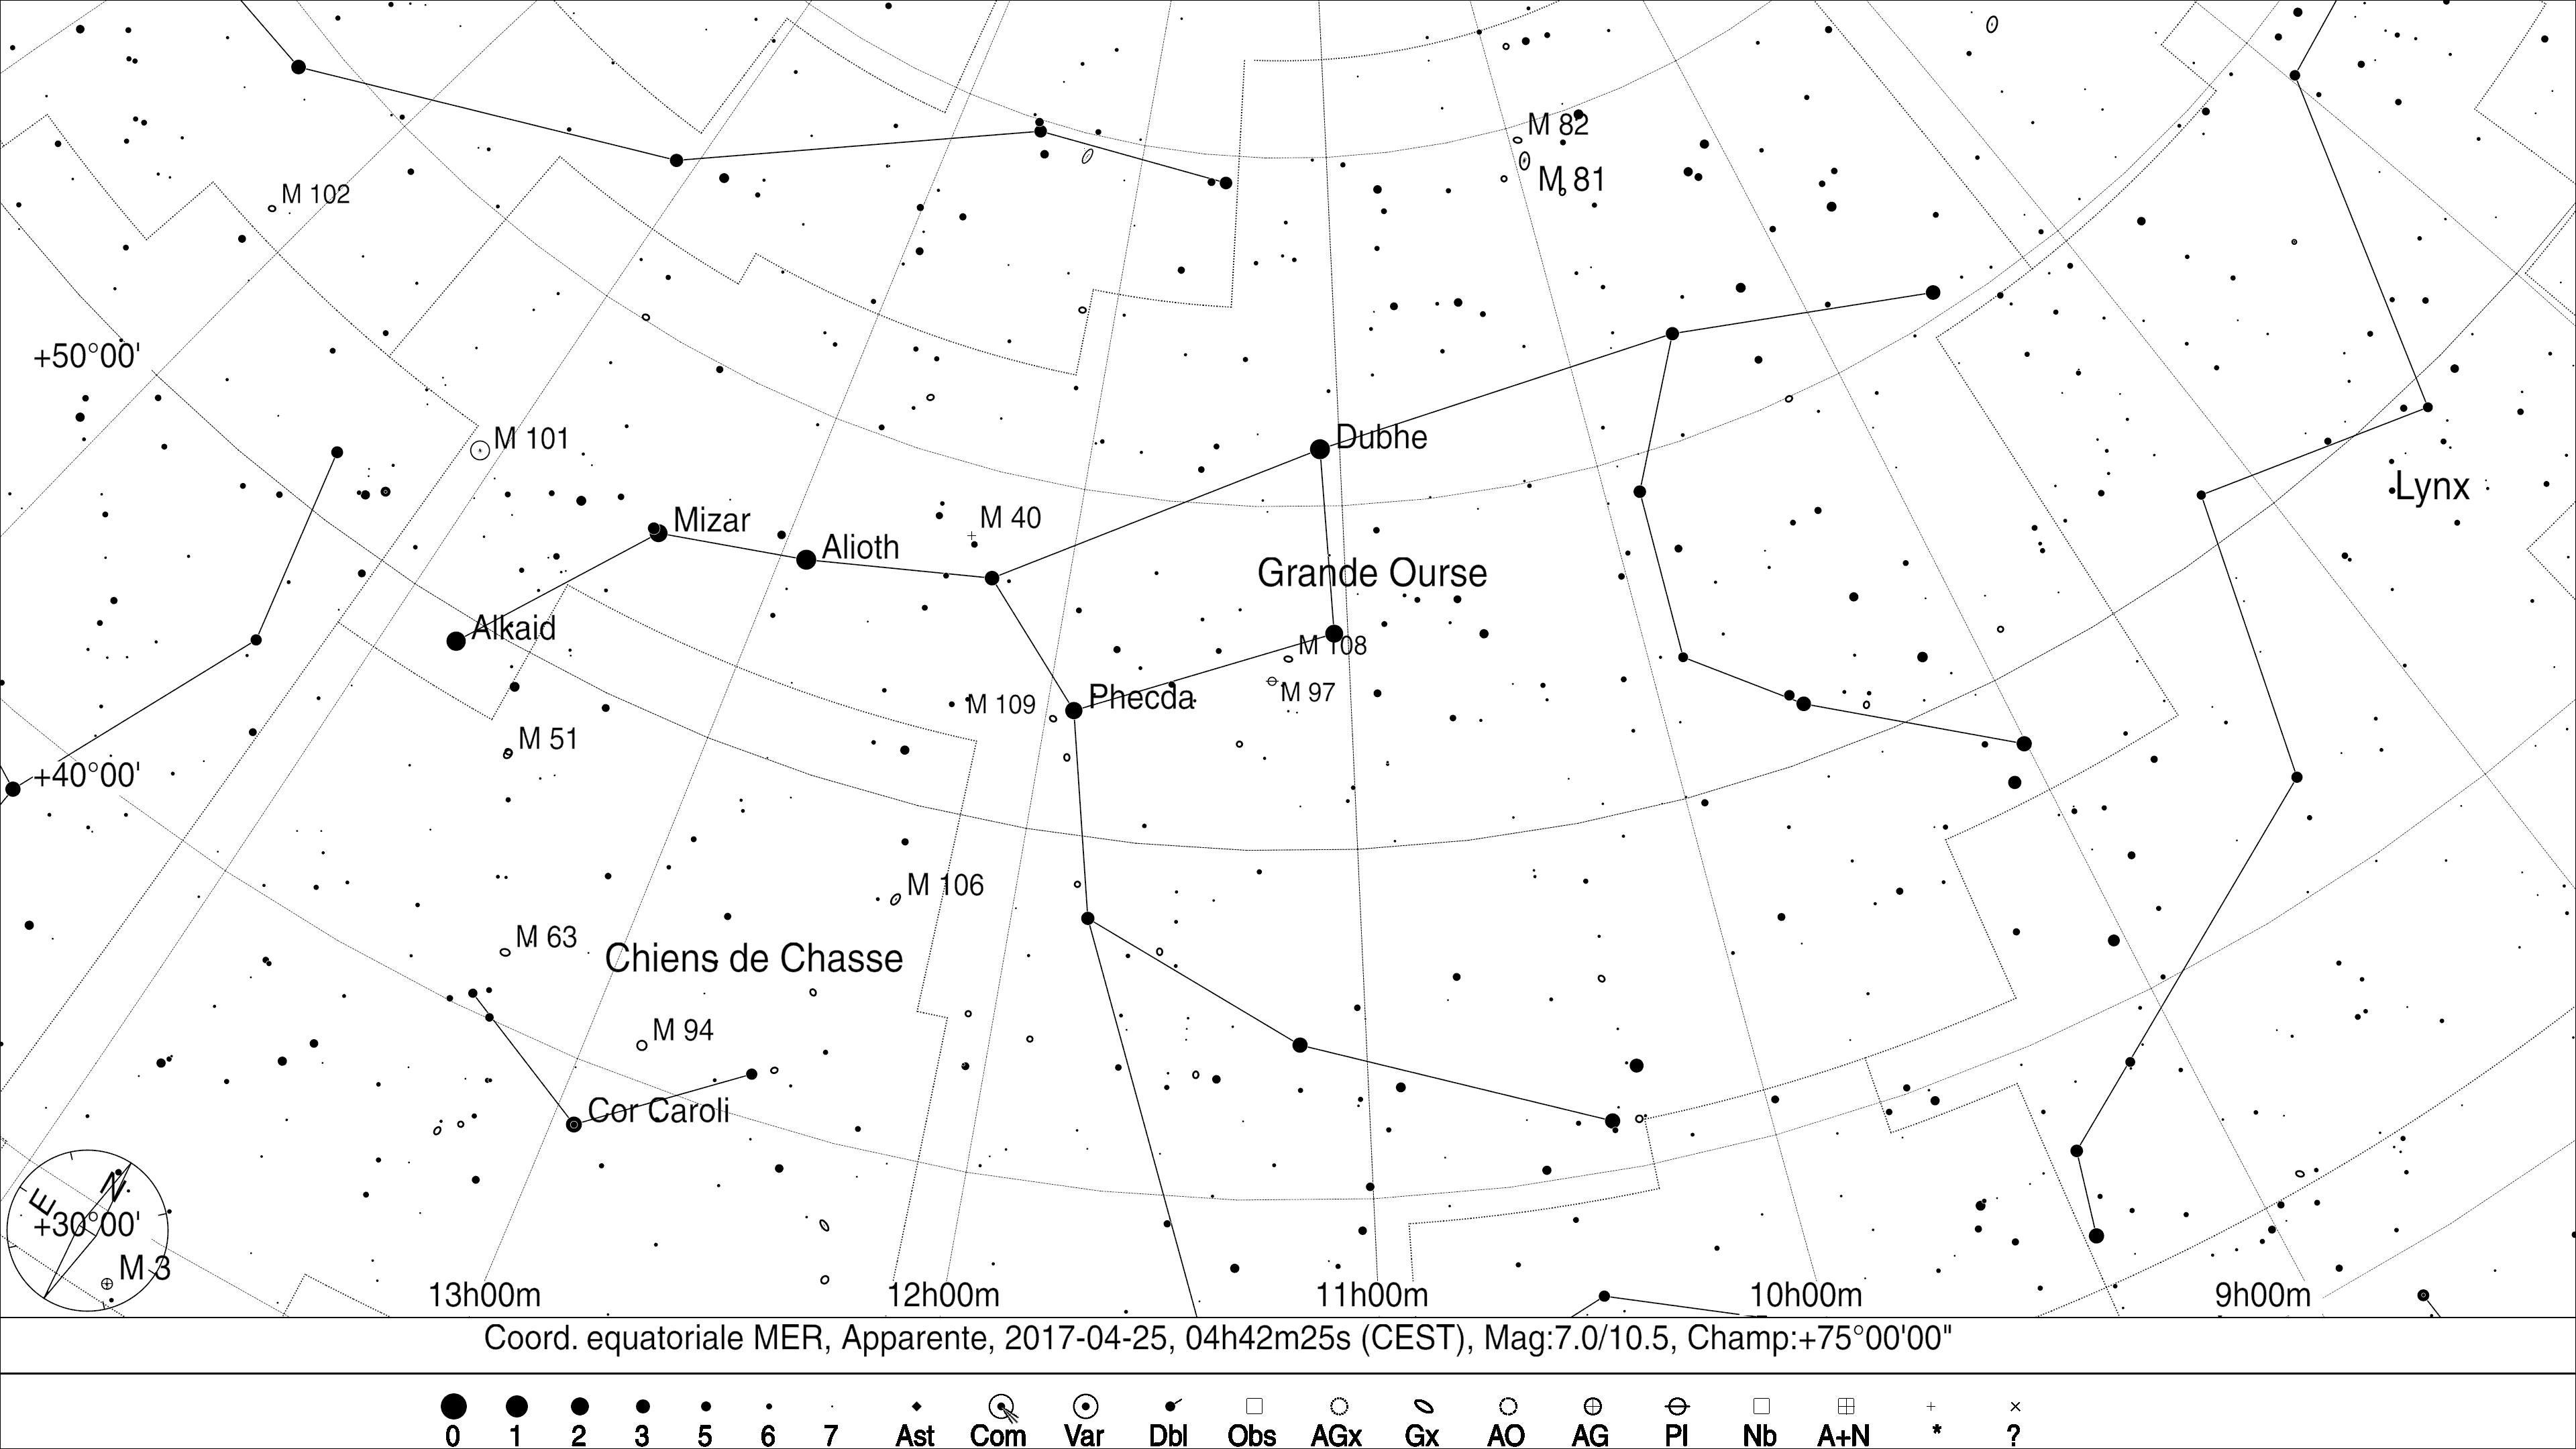 M108_75